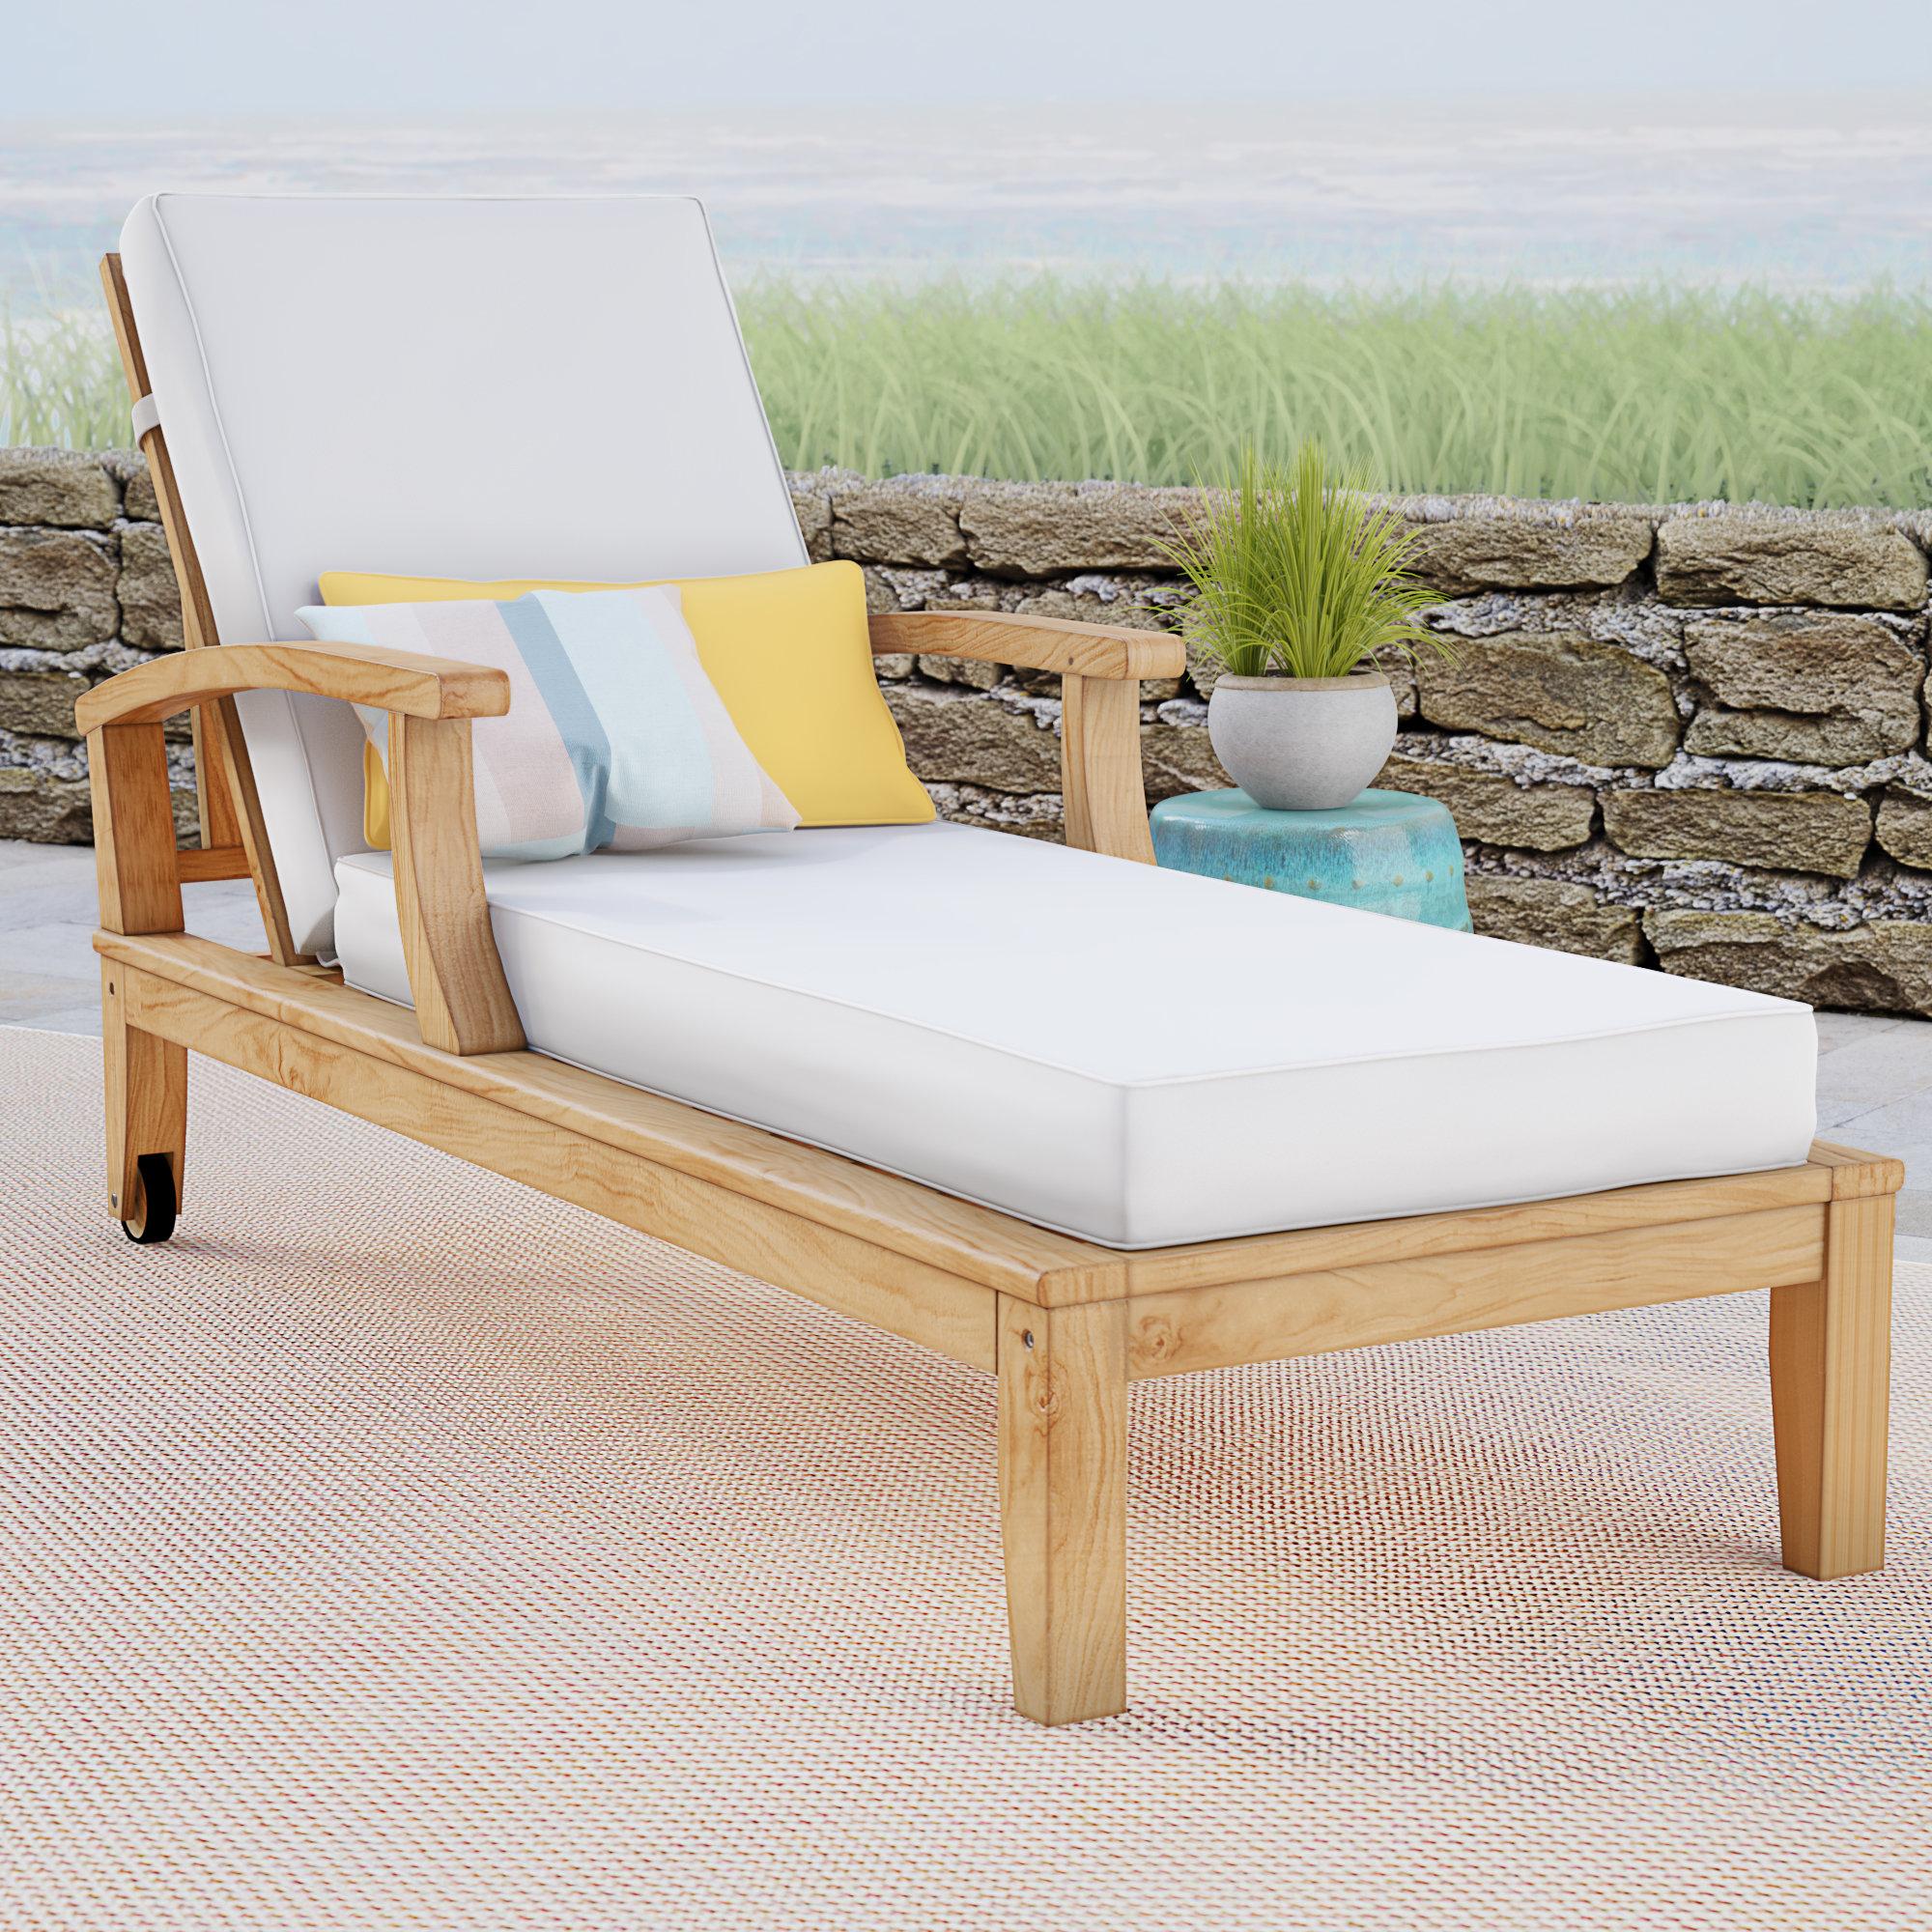 Elaina Teak Loveseats With Cushions Pertaining To 2020 Elaina Reclining Teak Chaise Lounge With Cushion (View 6 of 20)